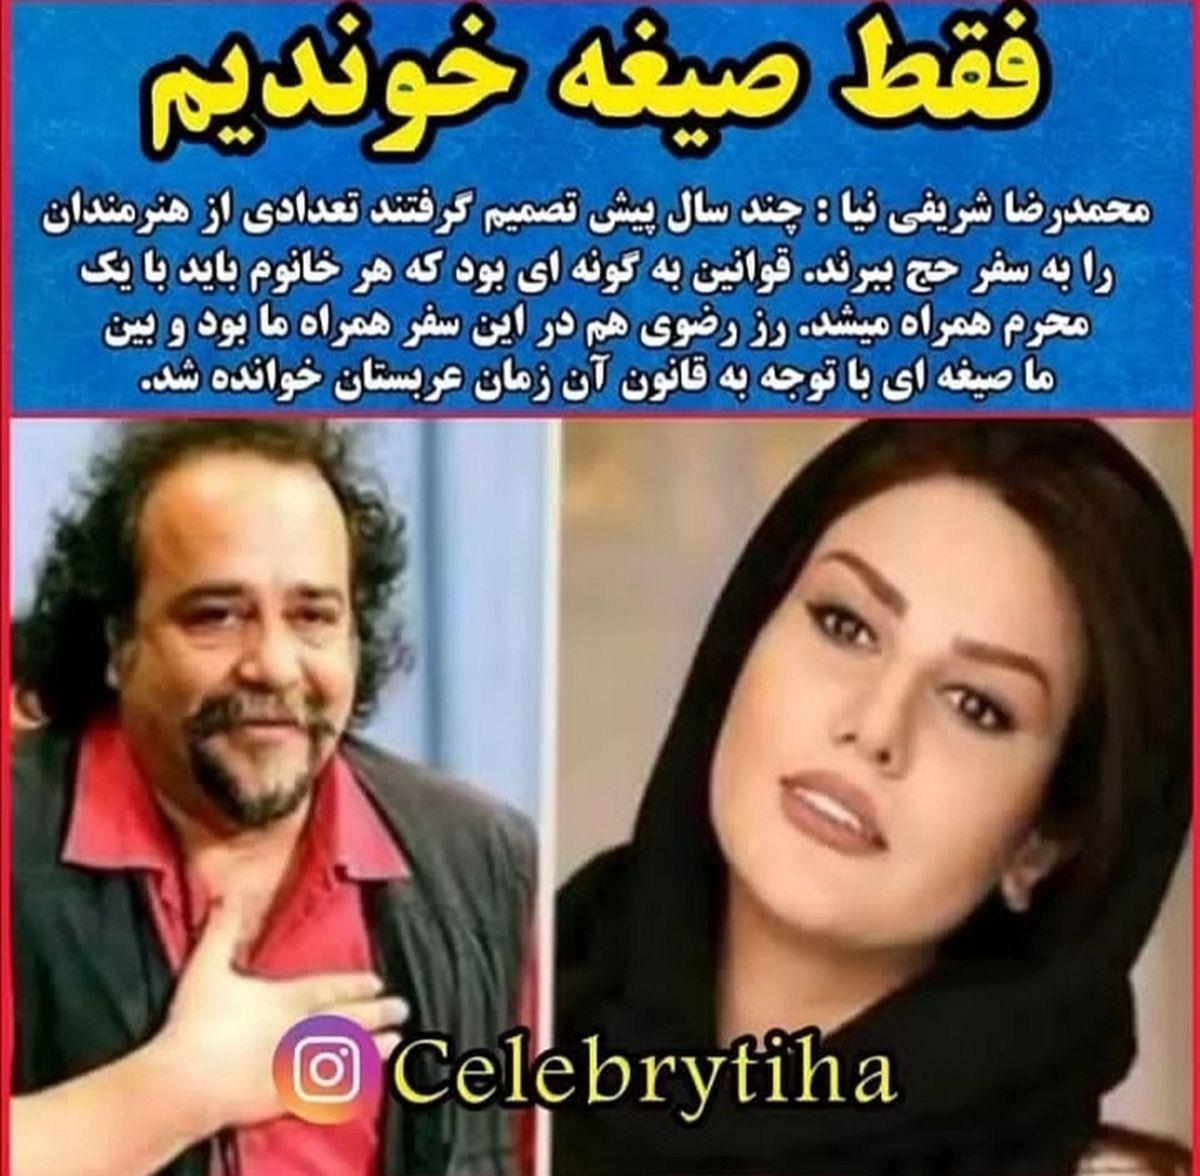 همسر صیغه ای و جوان محمدرضا شریفی نیا + عکس